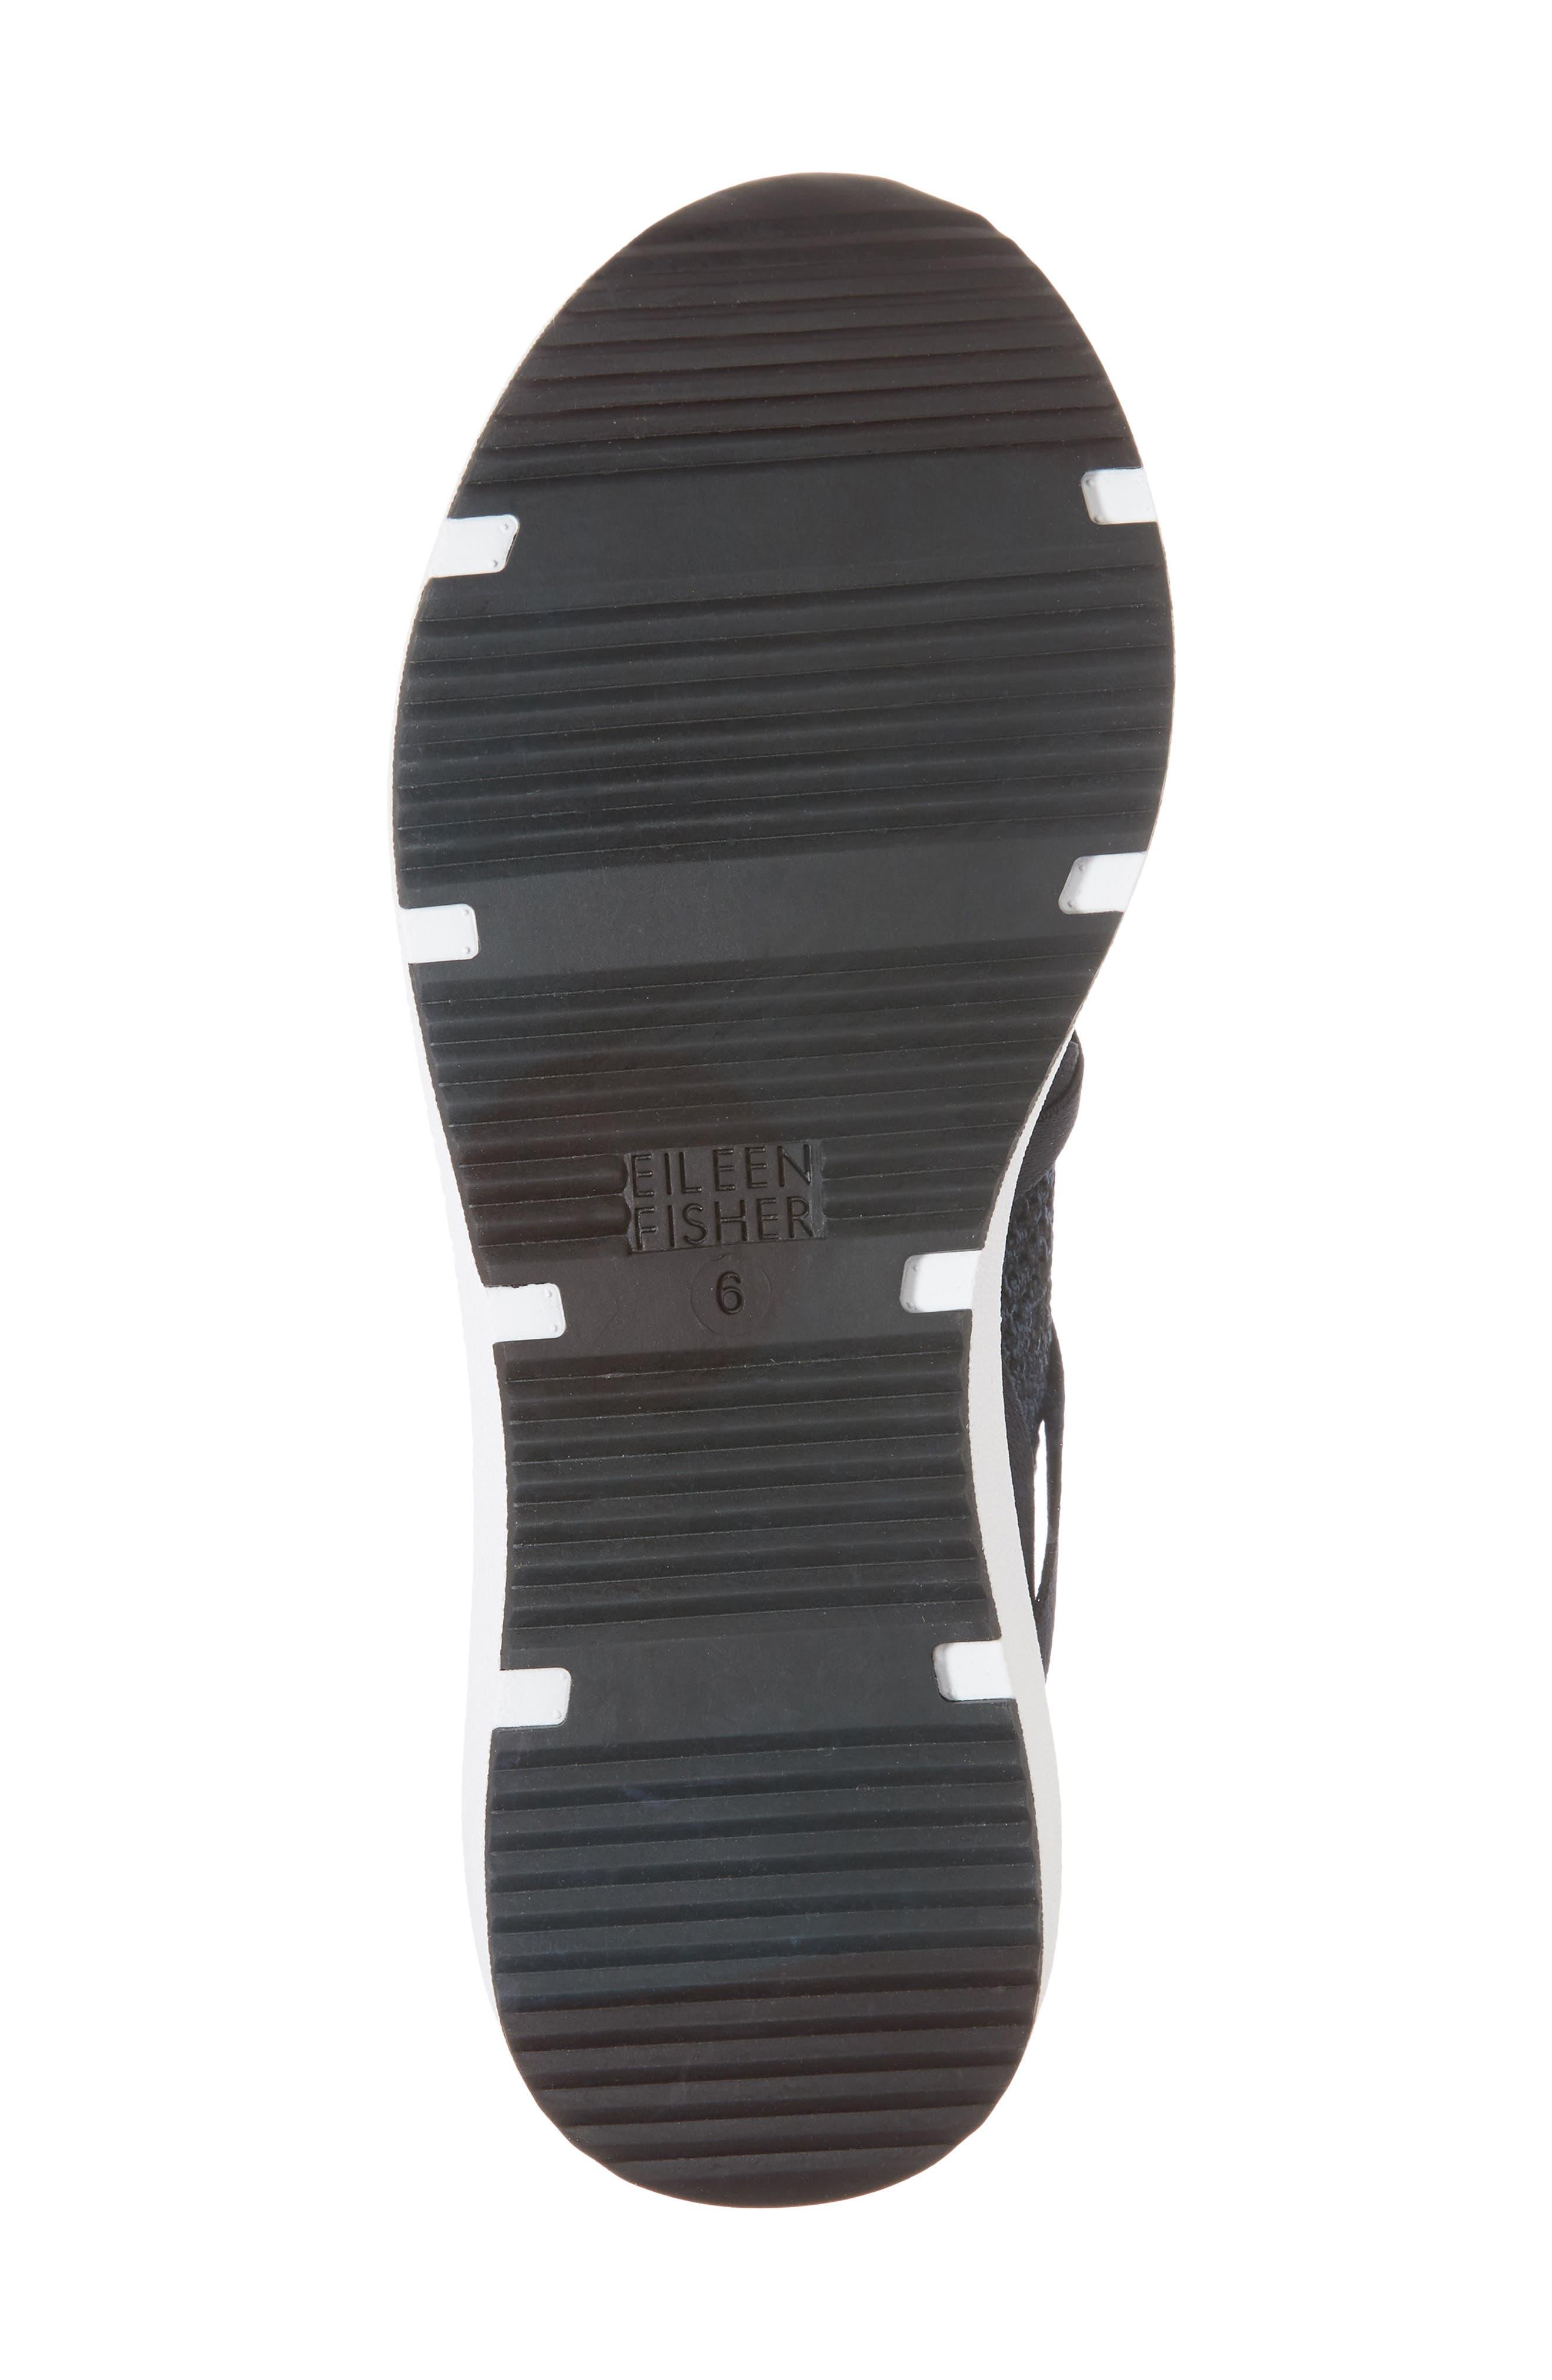 Xanady Woven Slip-On Sneaker,                             Alternate thumbnail 6, color,                             Black/ Marine Stretch